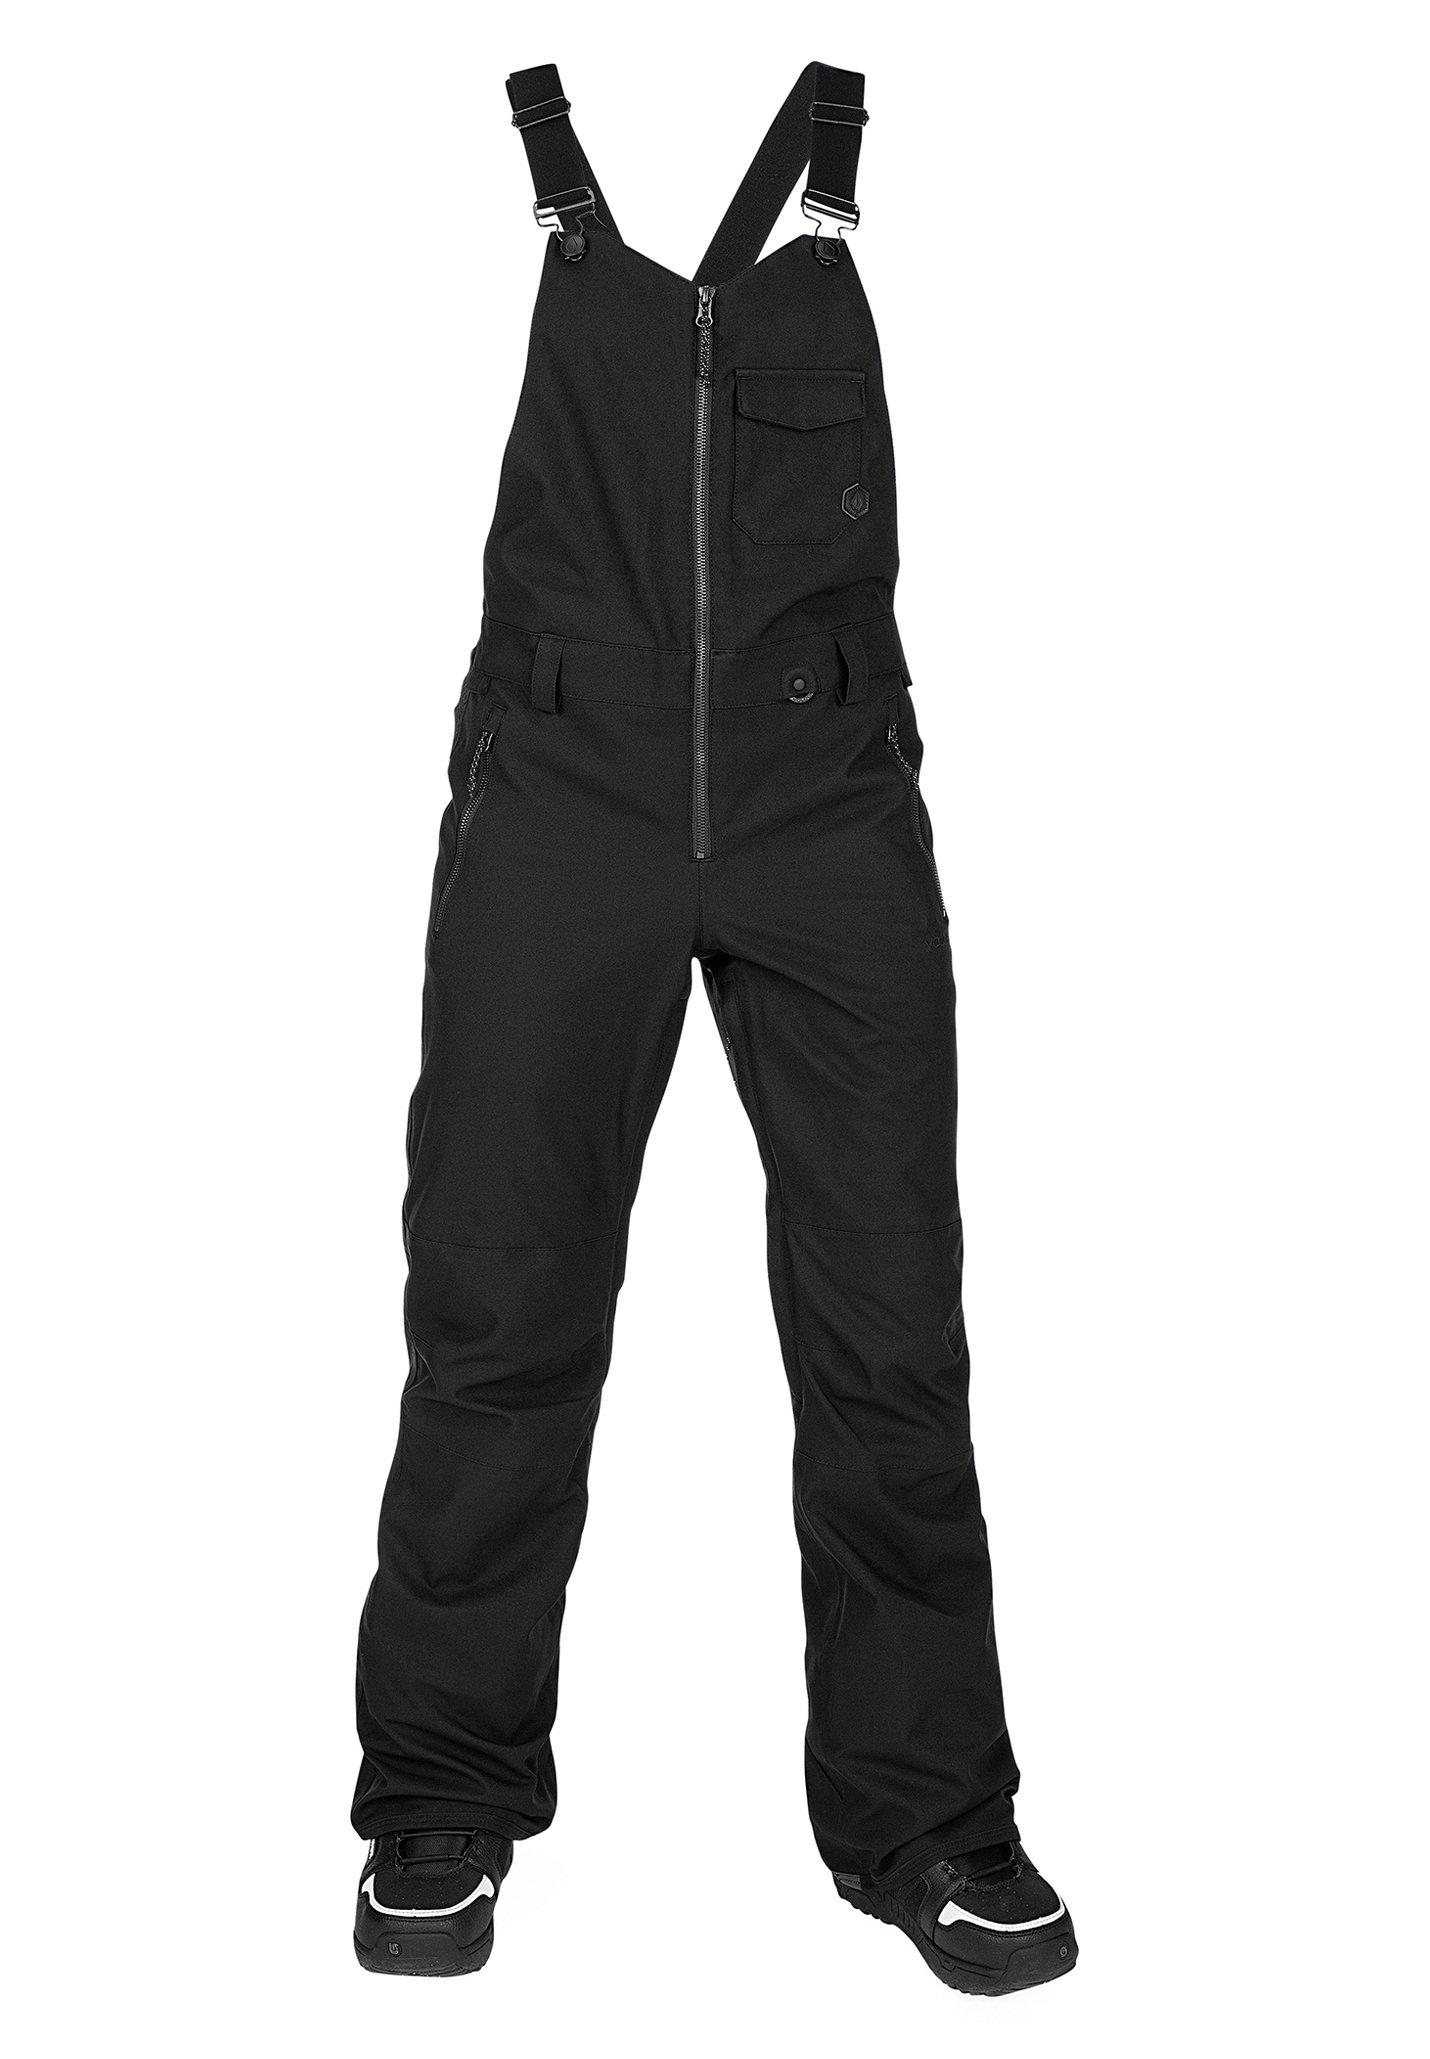 Femme SWIFT BIB OVERALL - Pantalon de ski